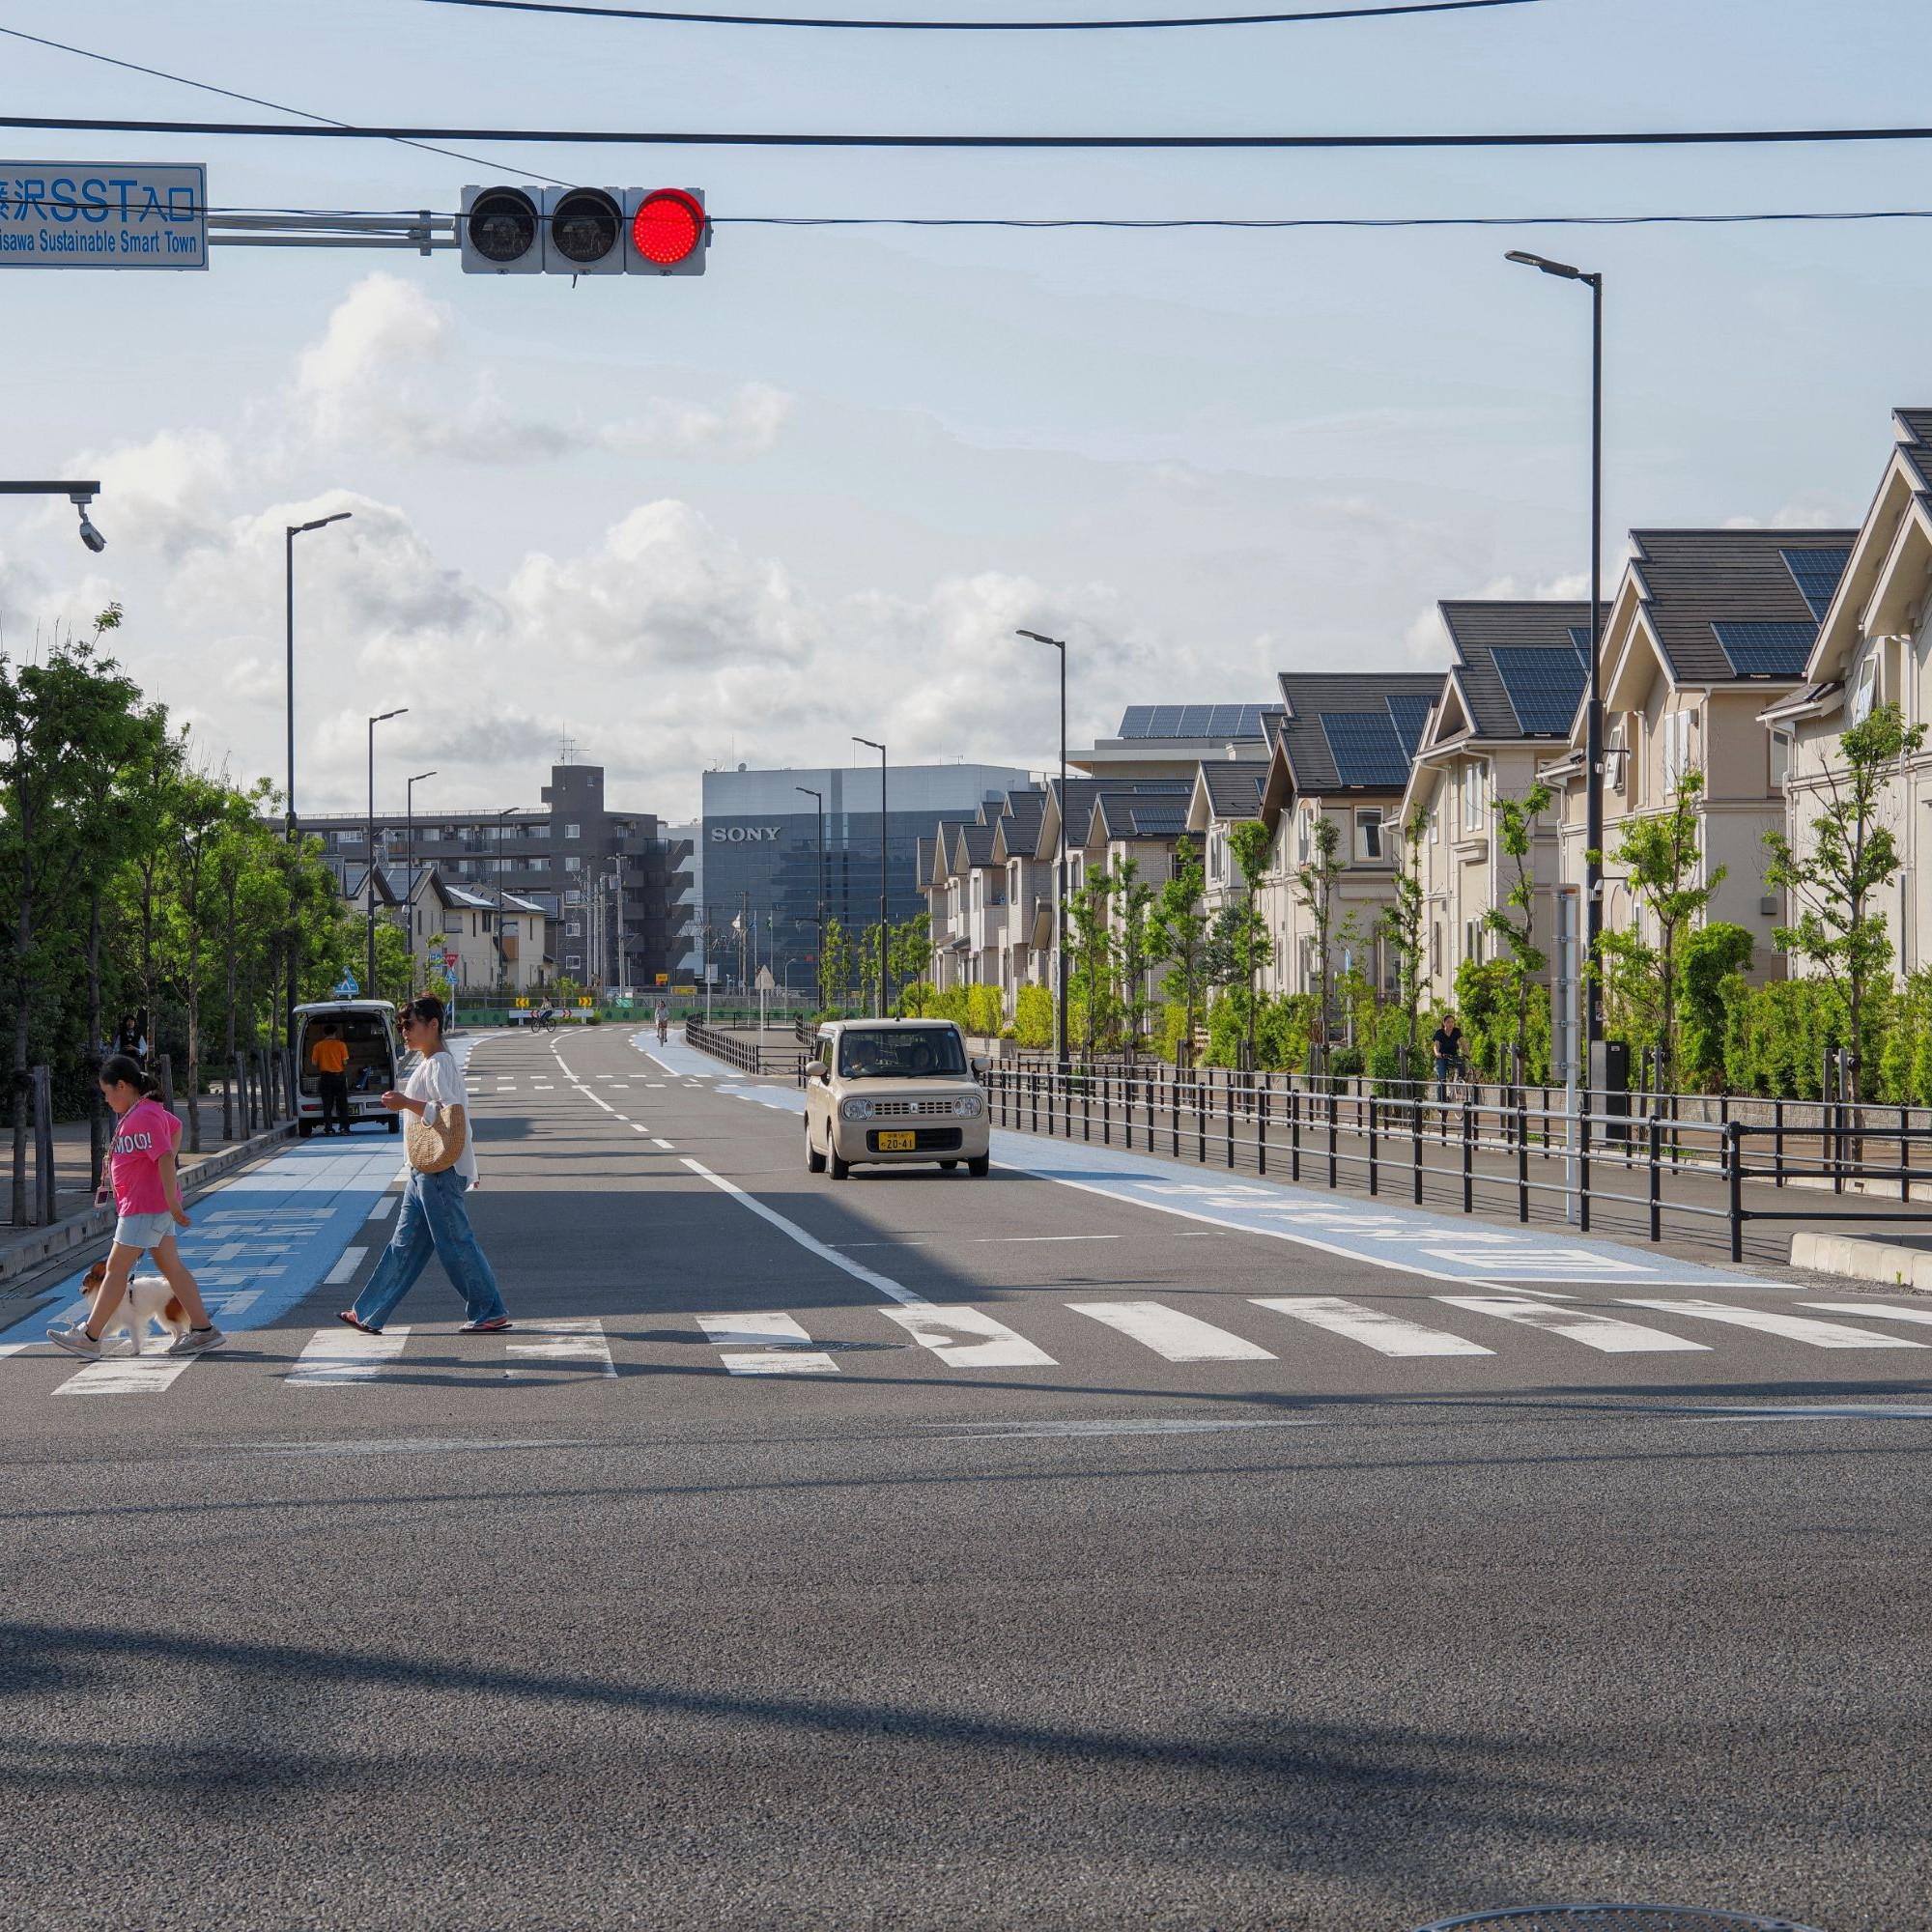 Einfahrt zu Fujisawa Sustainable Smart Town Japan